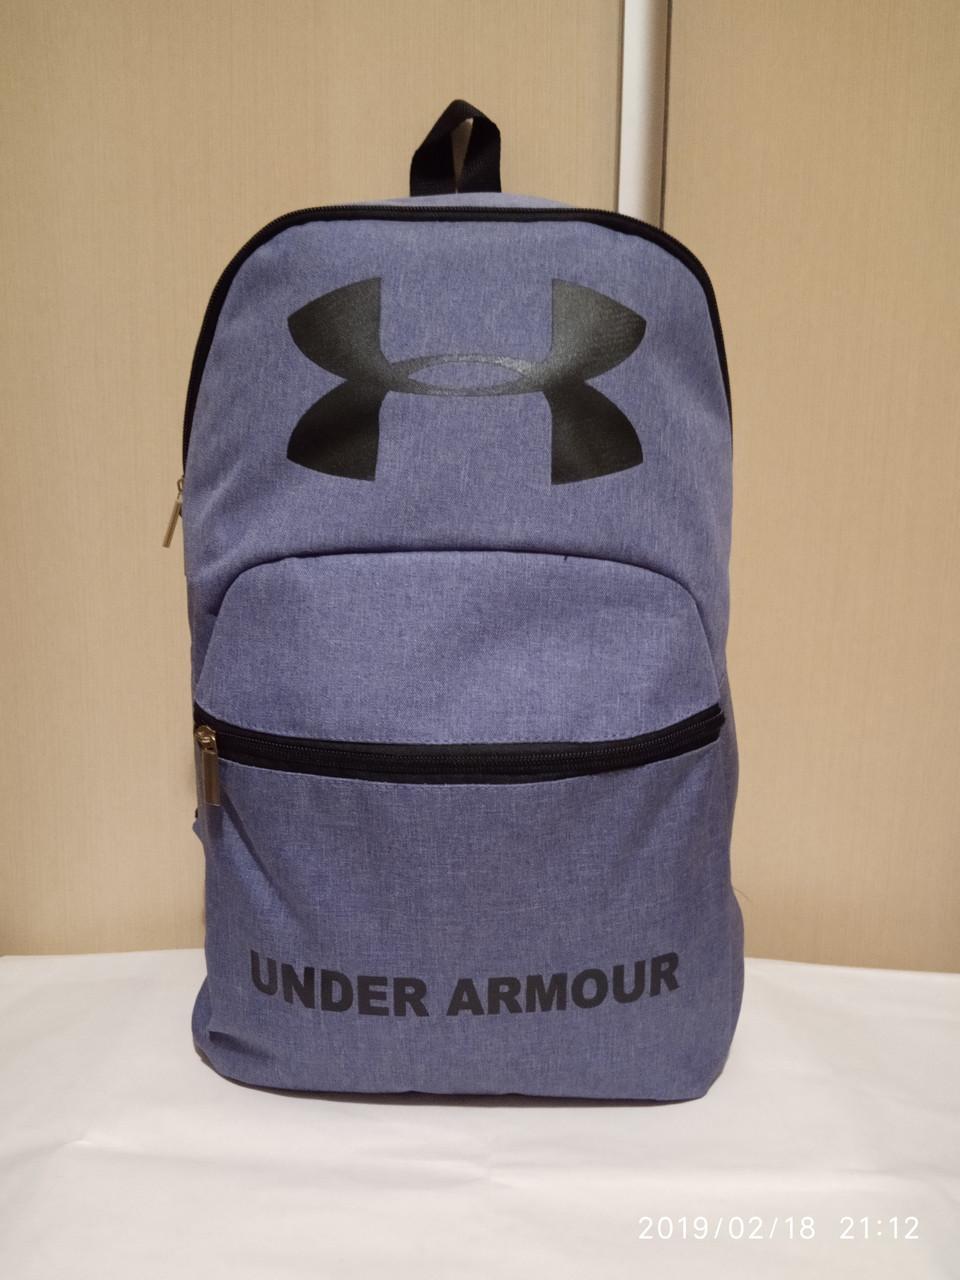 Спортивный рюкзак Меланж (реплика), синий цвет